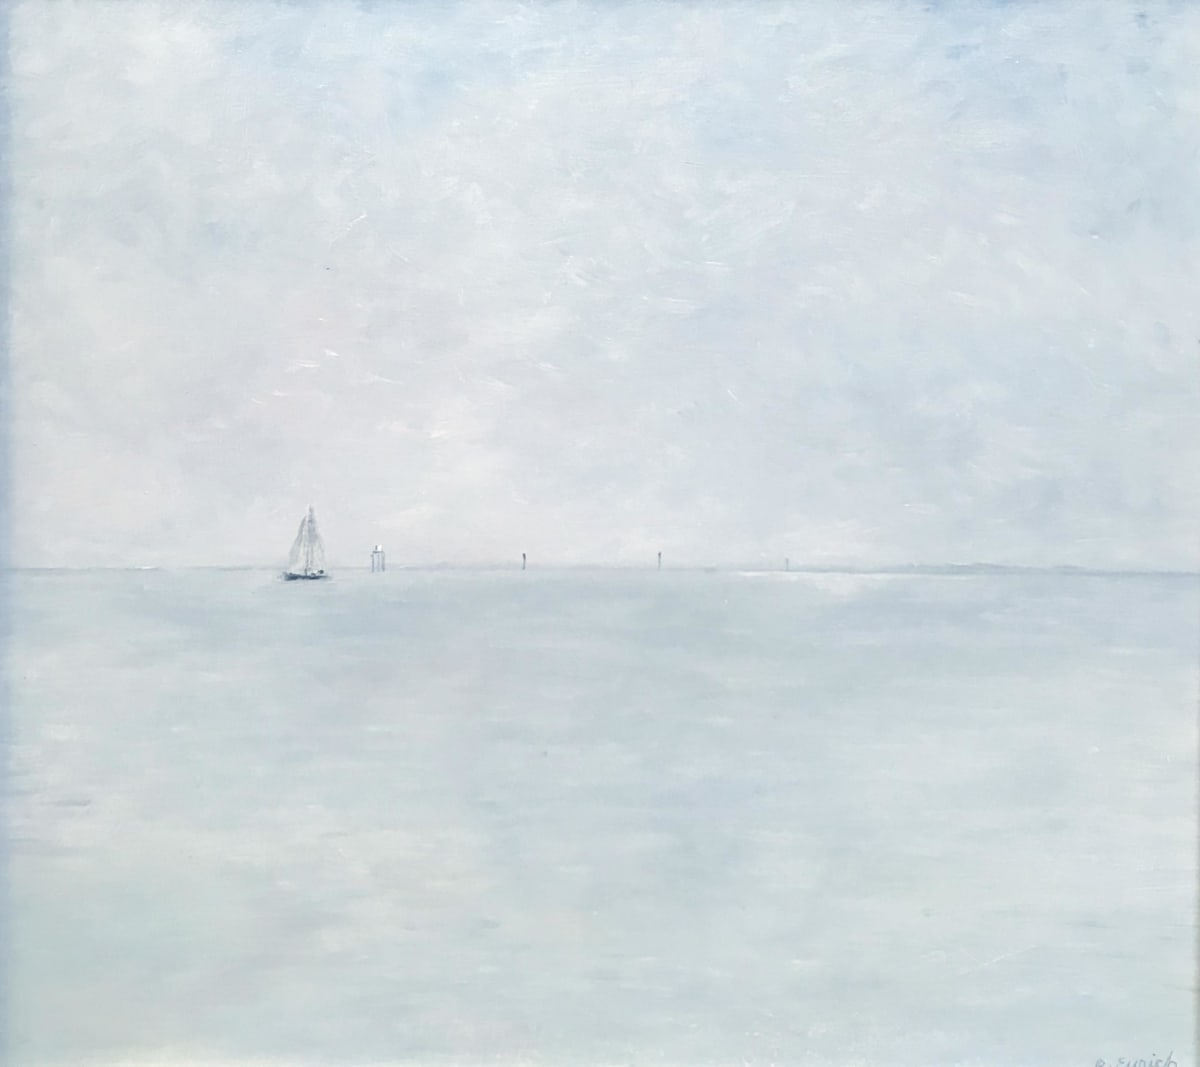 Richard Eurich, Lone sailer, 1988